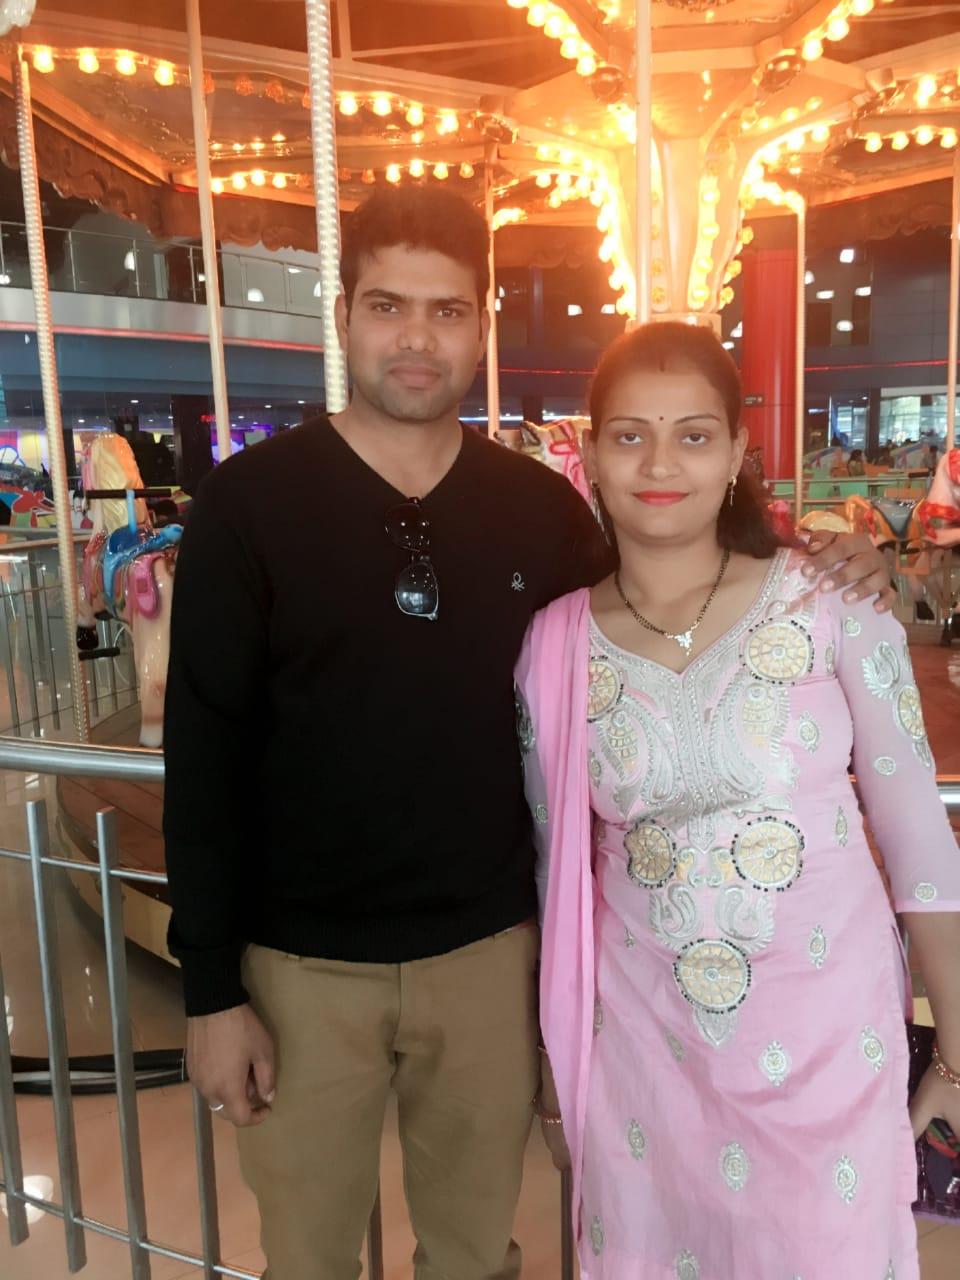 Cpl Pankaj Kumar with his wife Smt Megha